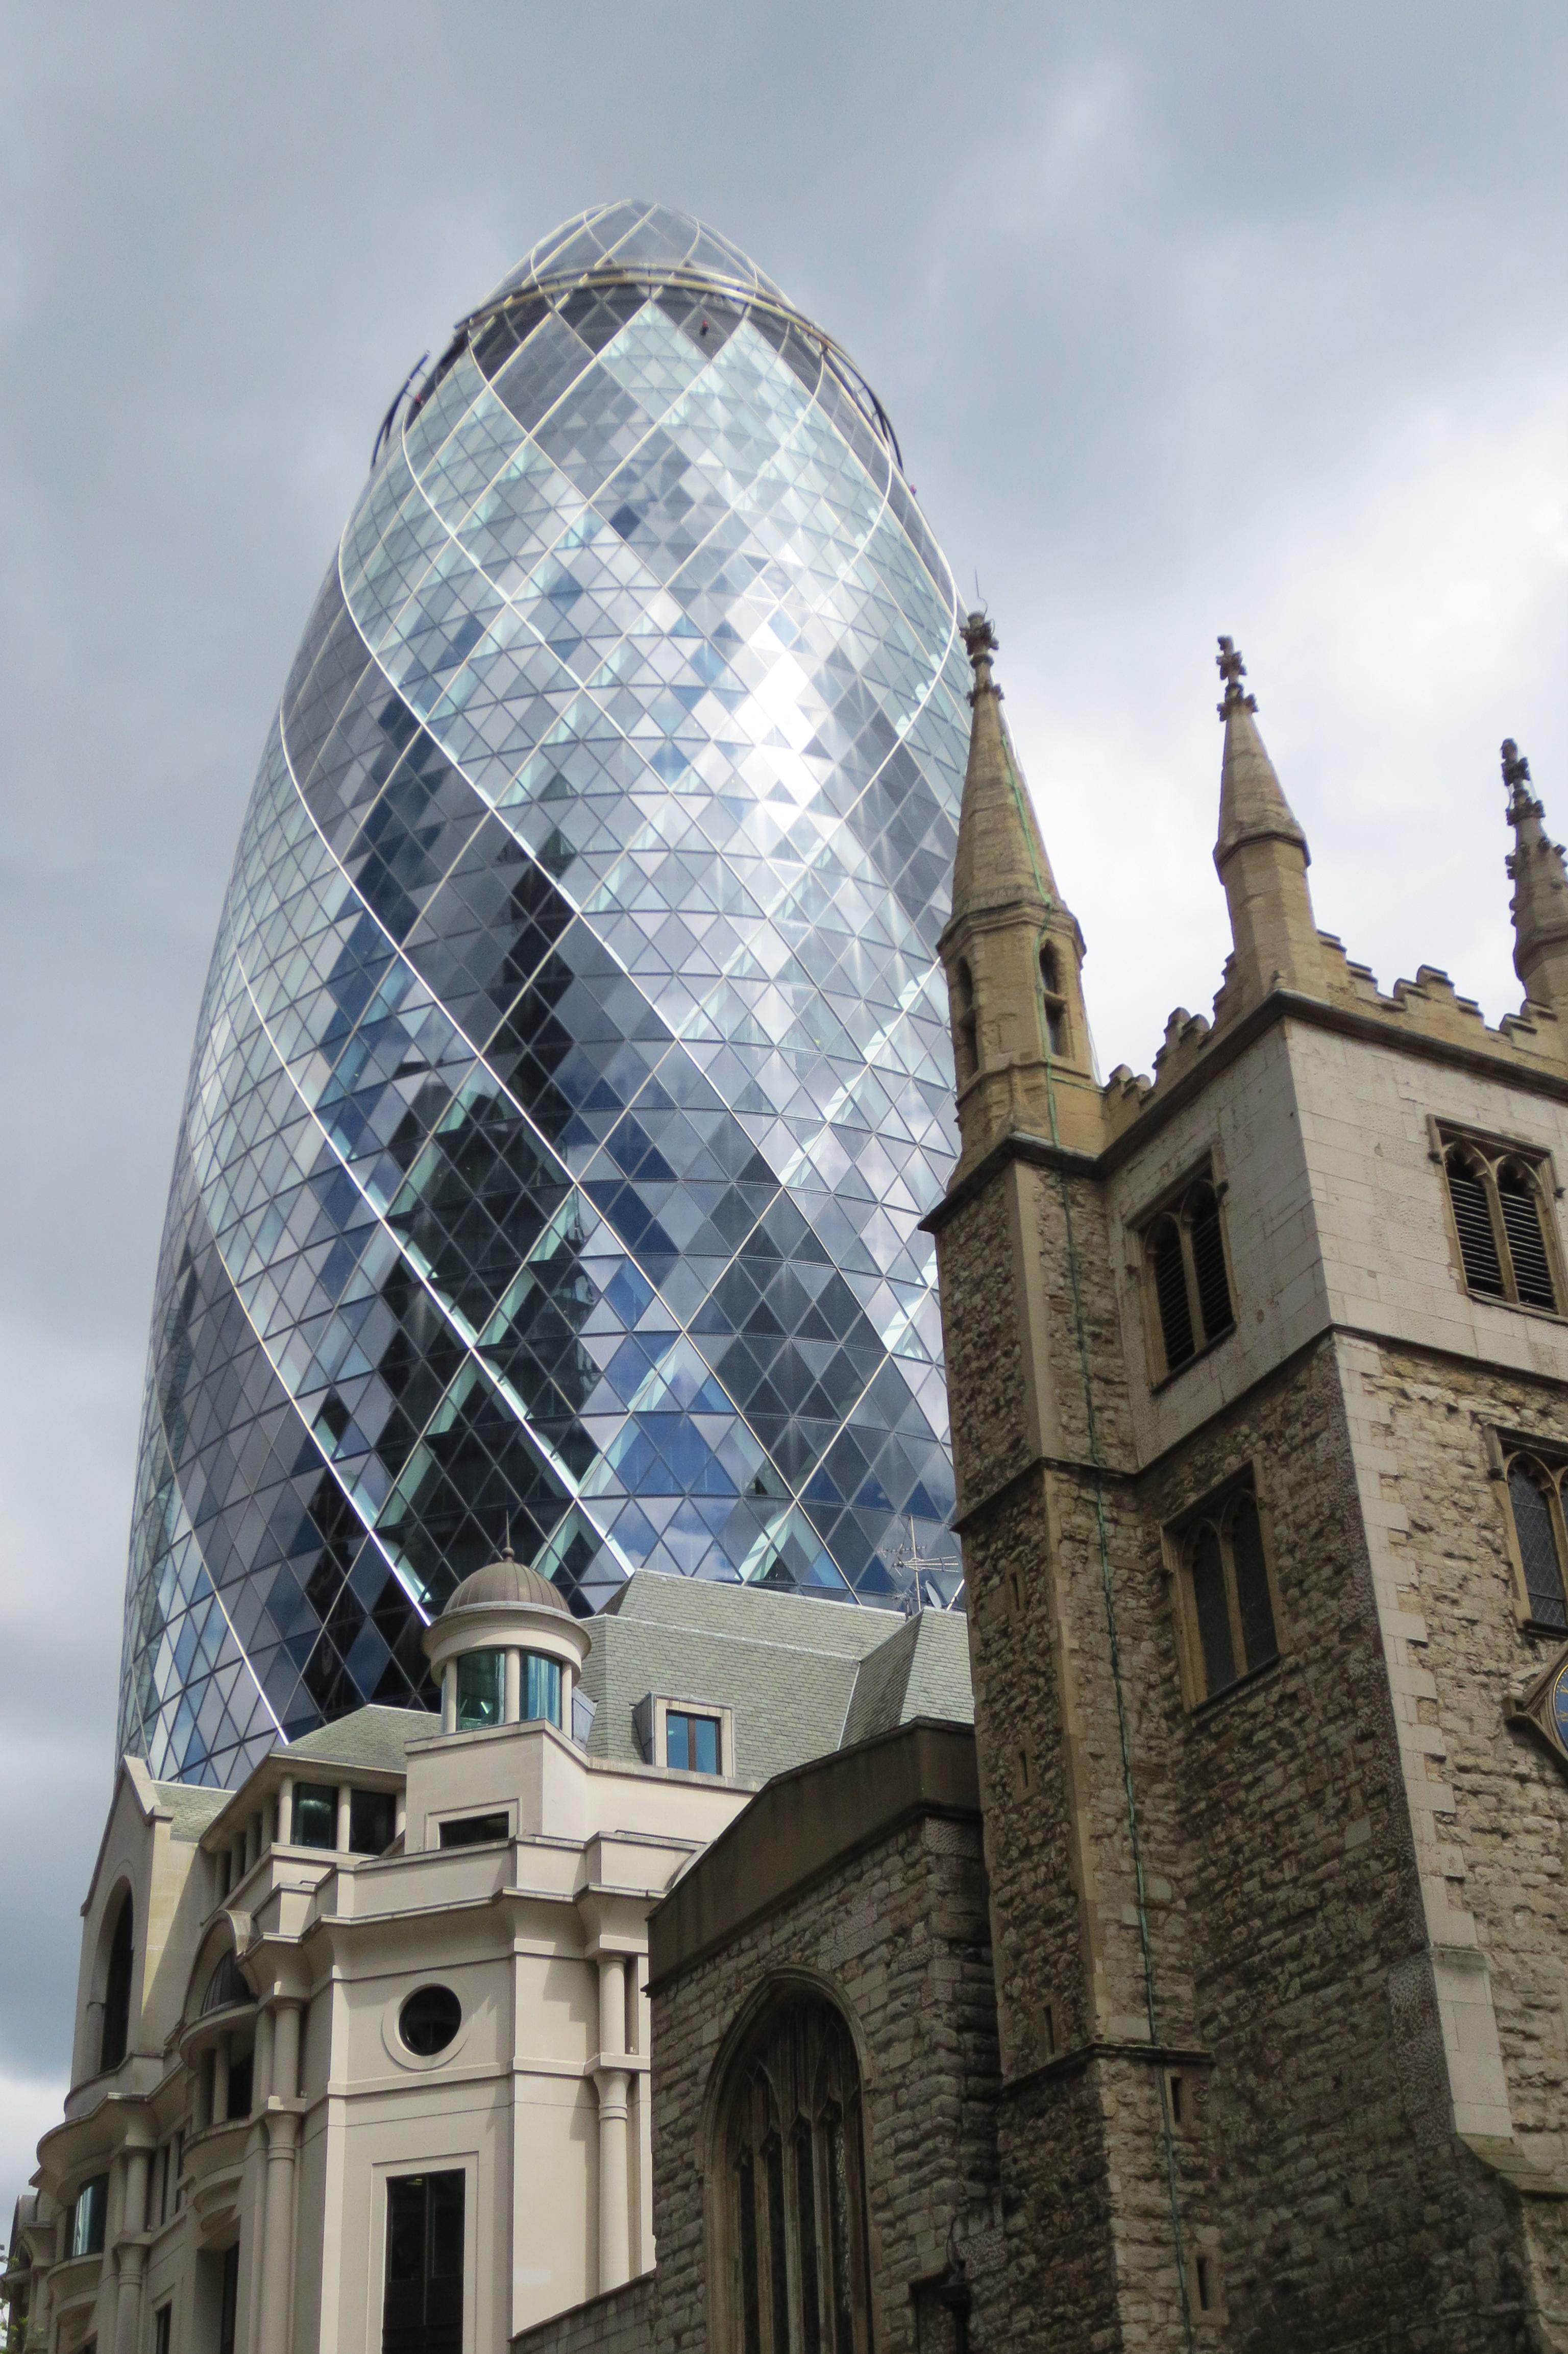 30 st mary axe the gherkin data photos plans for 13th floor in buildings